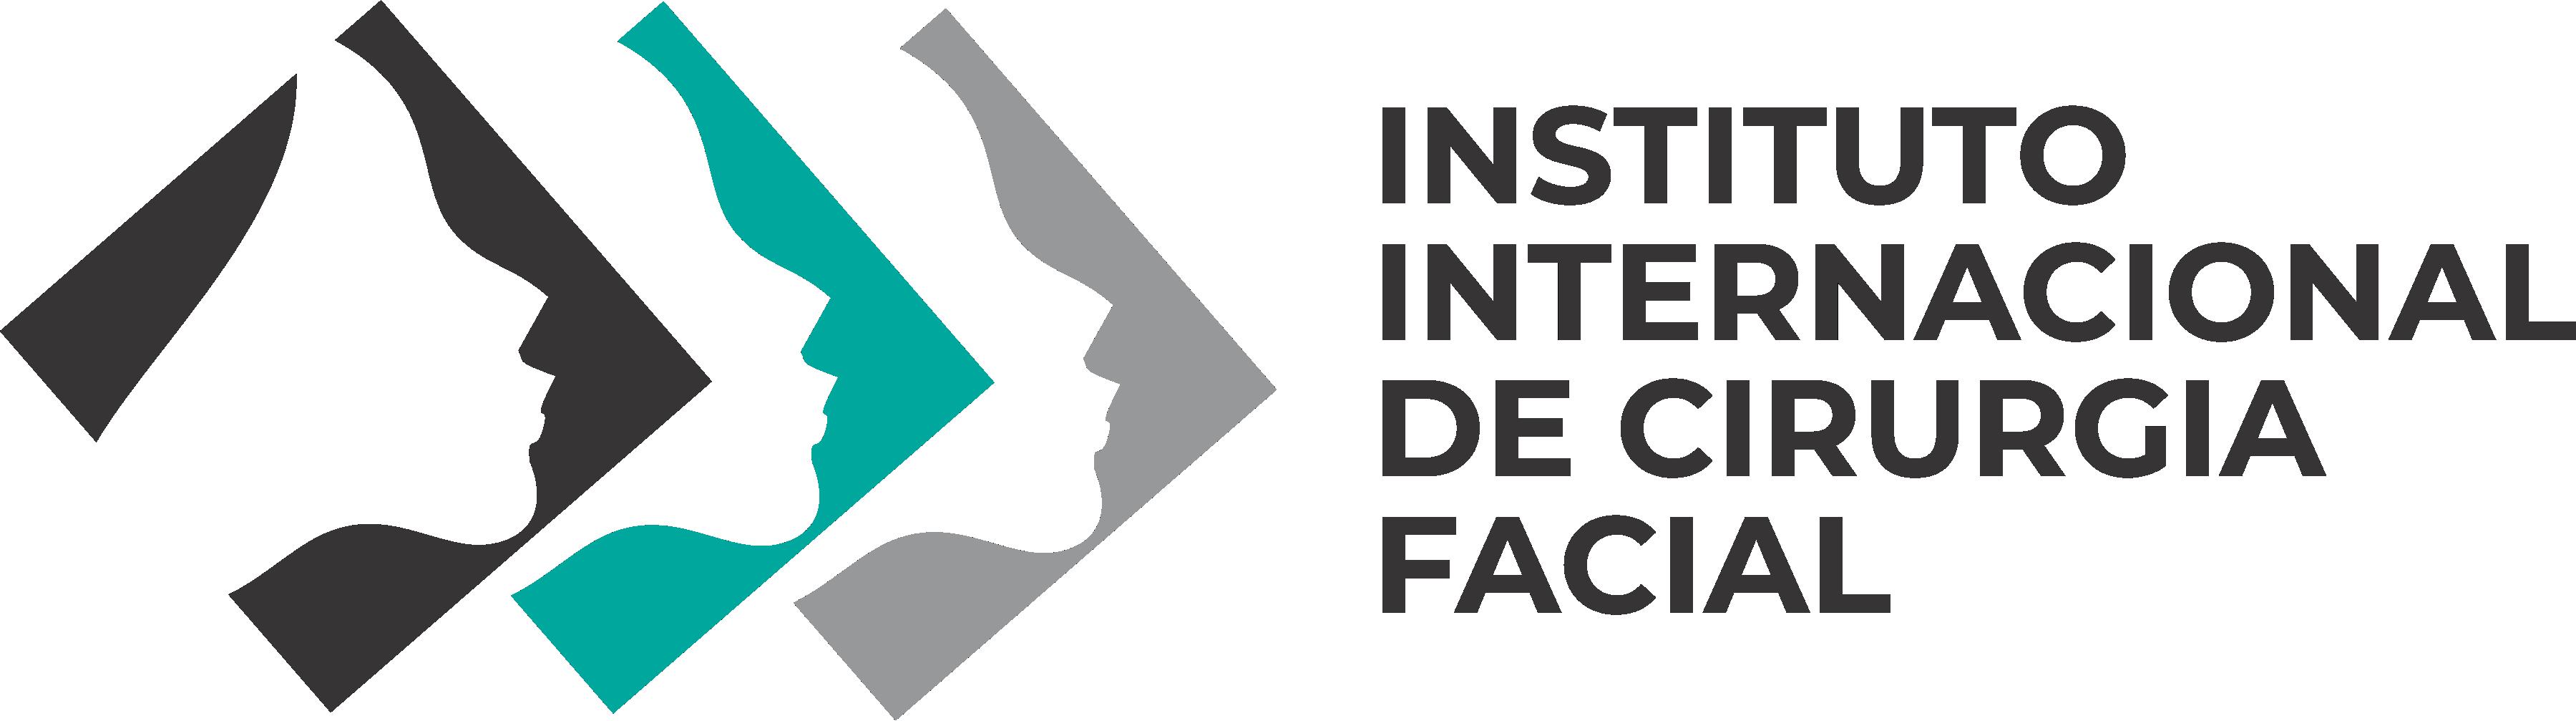 Logo 19 - Instituto Internacional de Cirurgia